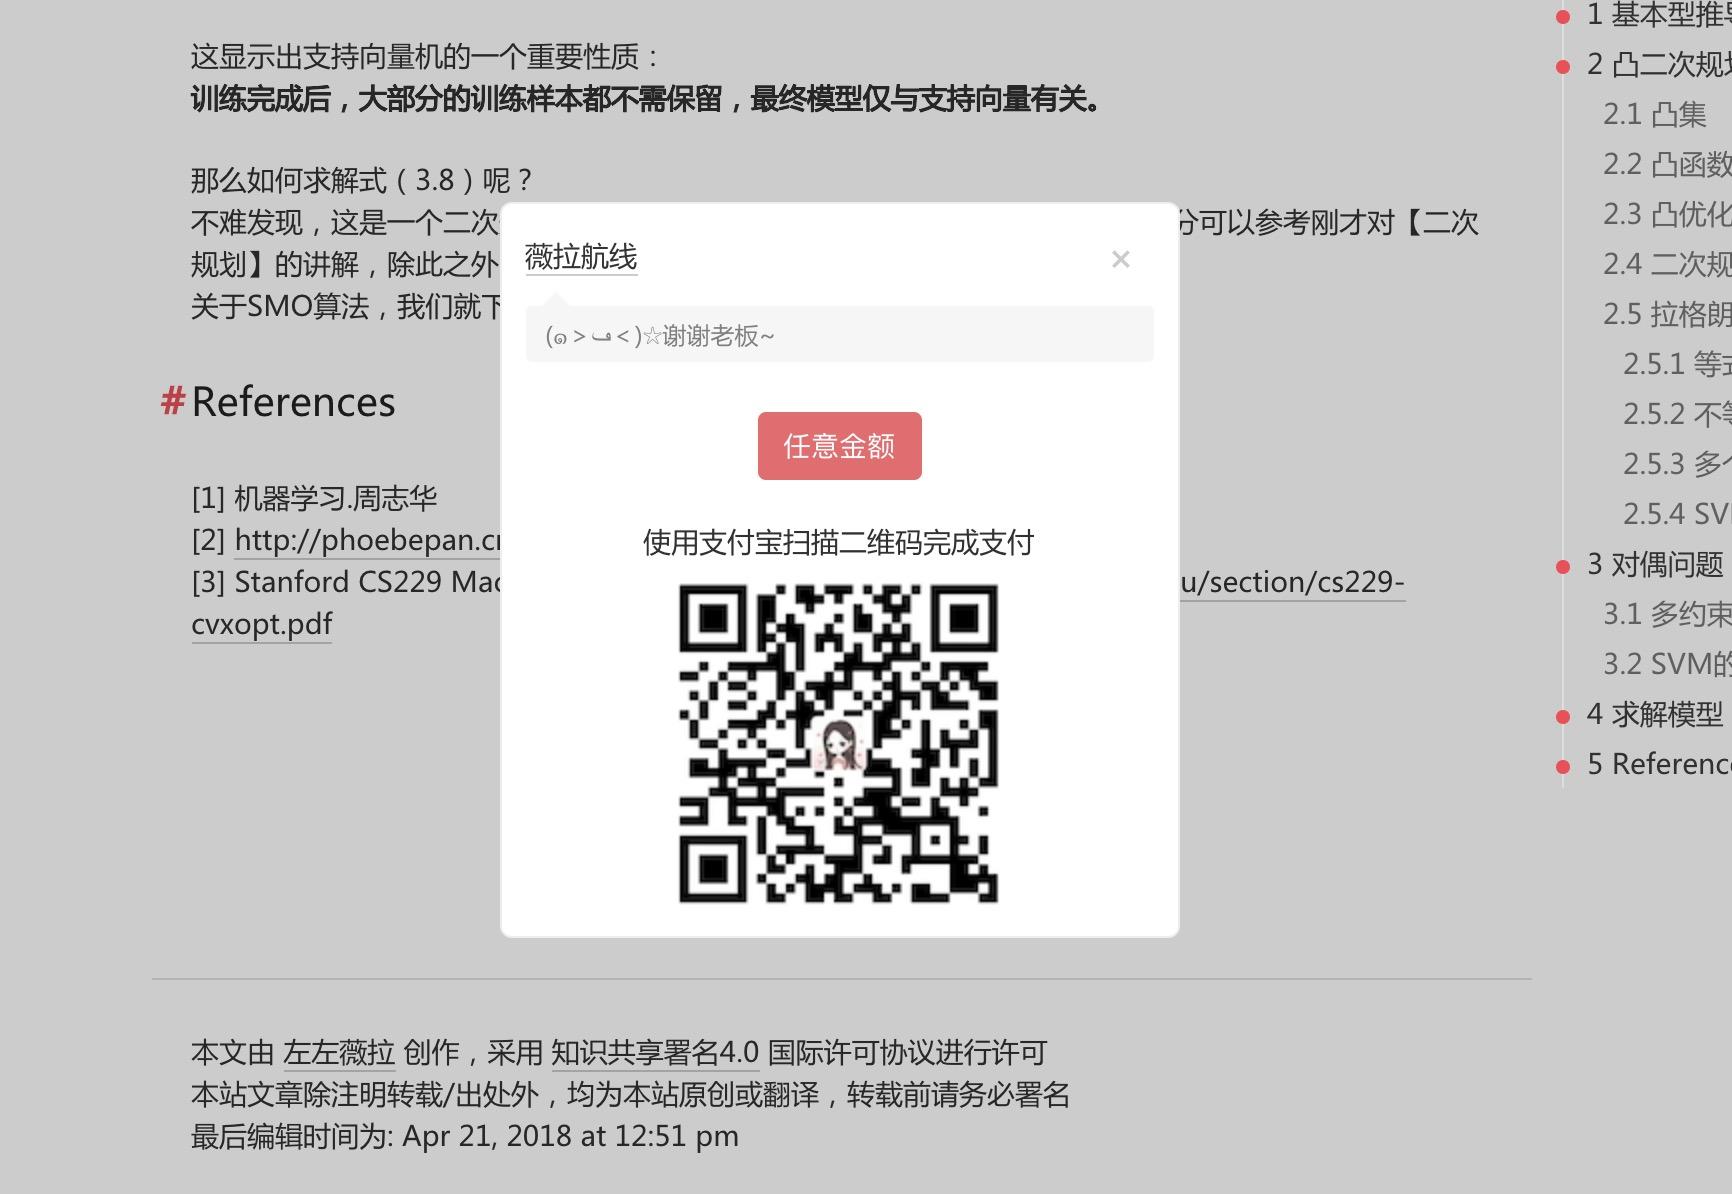 CC68F2D9-F34A-41C2-A678-6012545B80BC.png